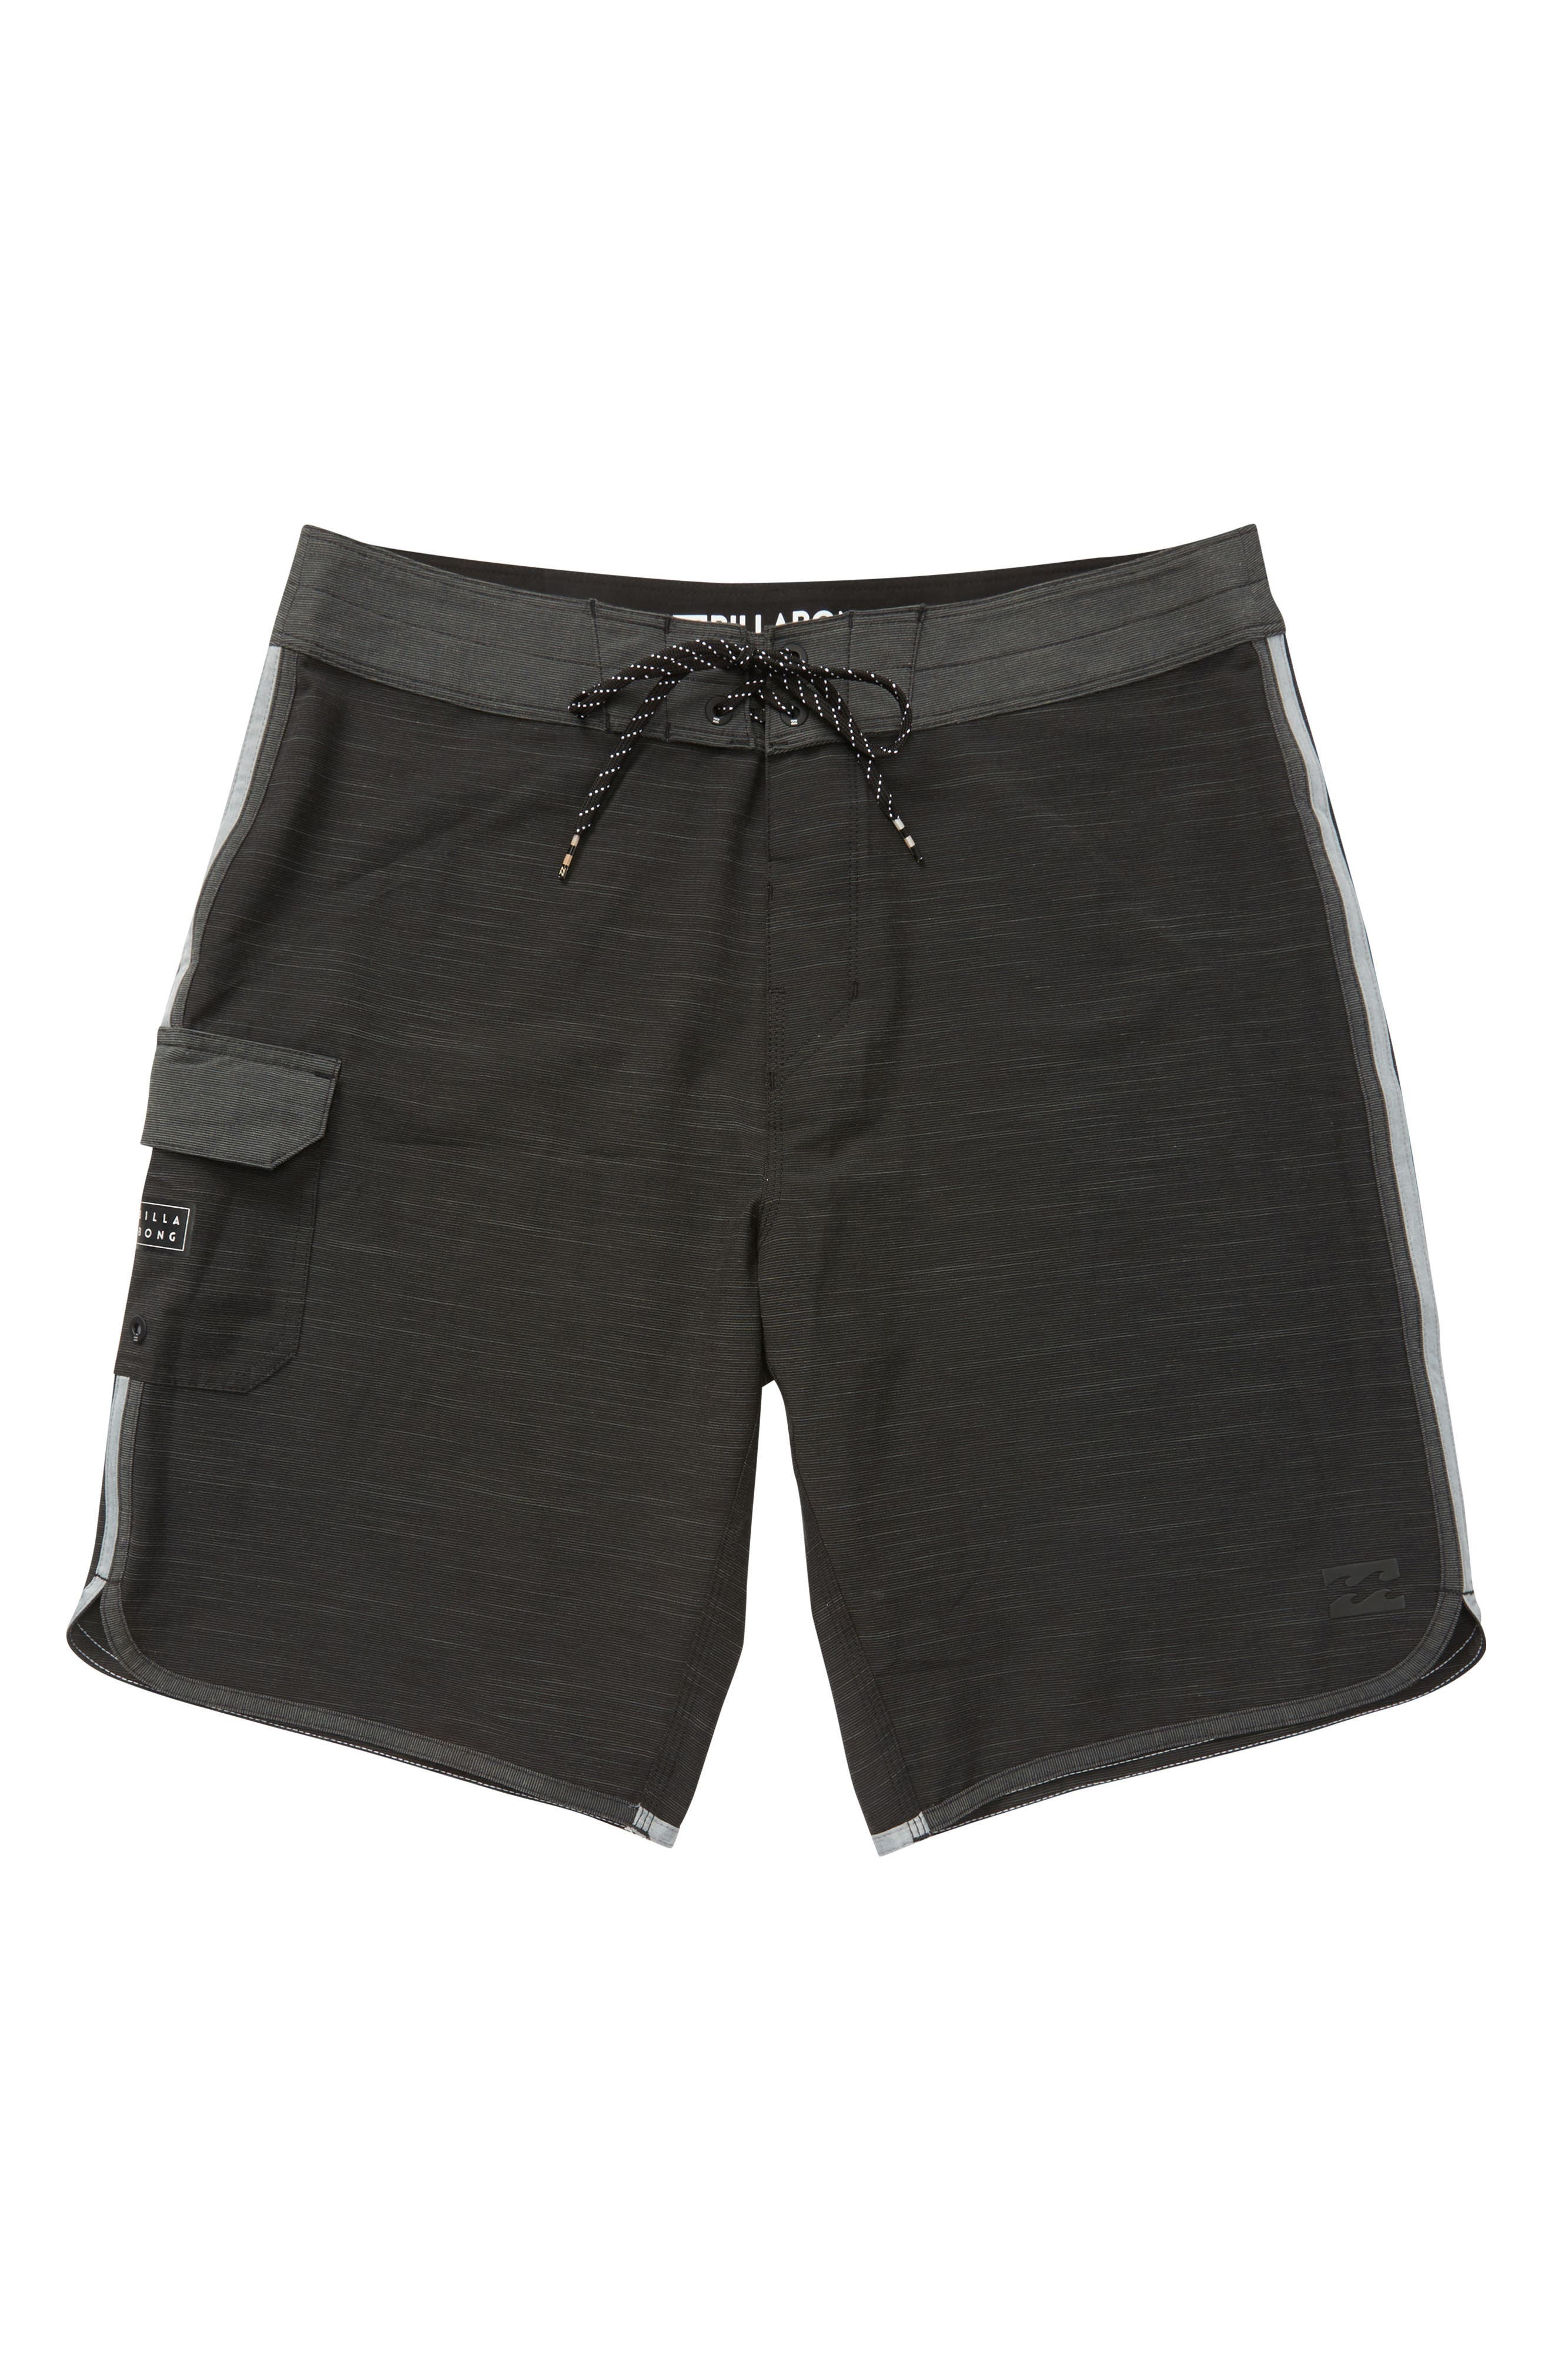 73 X Board Shorts,                         Main,                         color, Black